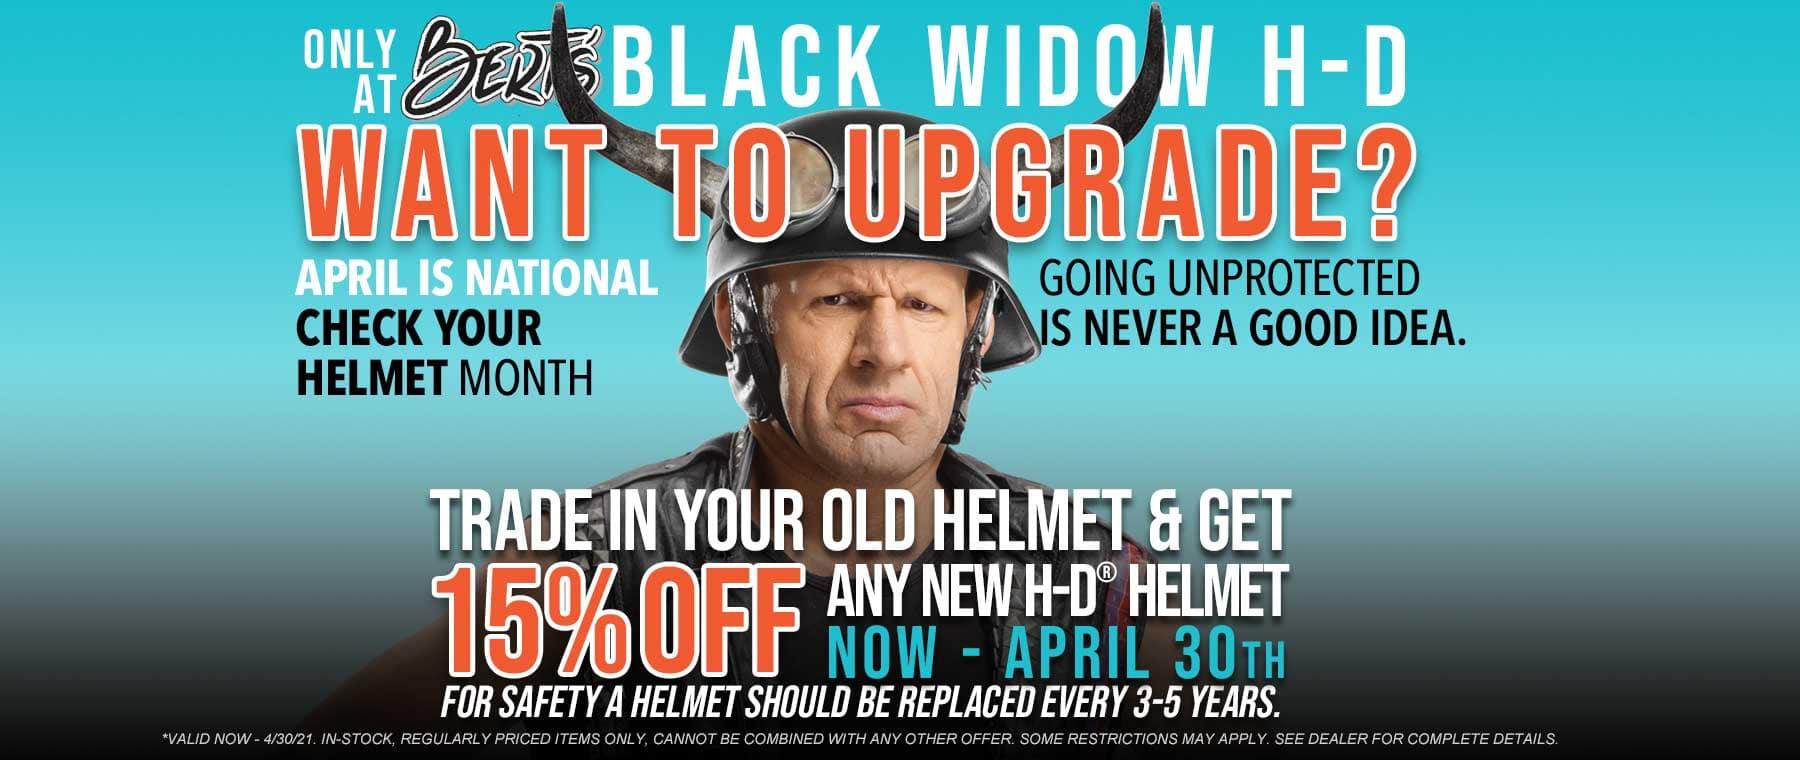 BERTS-HD_040721_HelmetAwareness-web